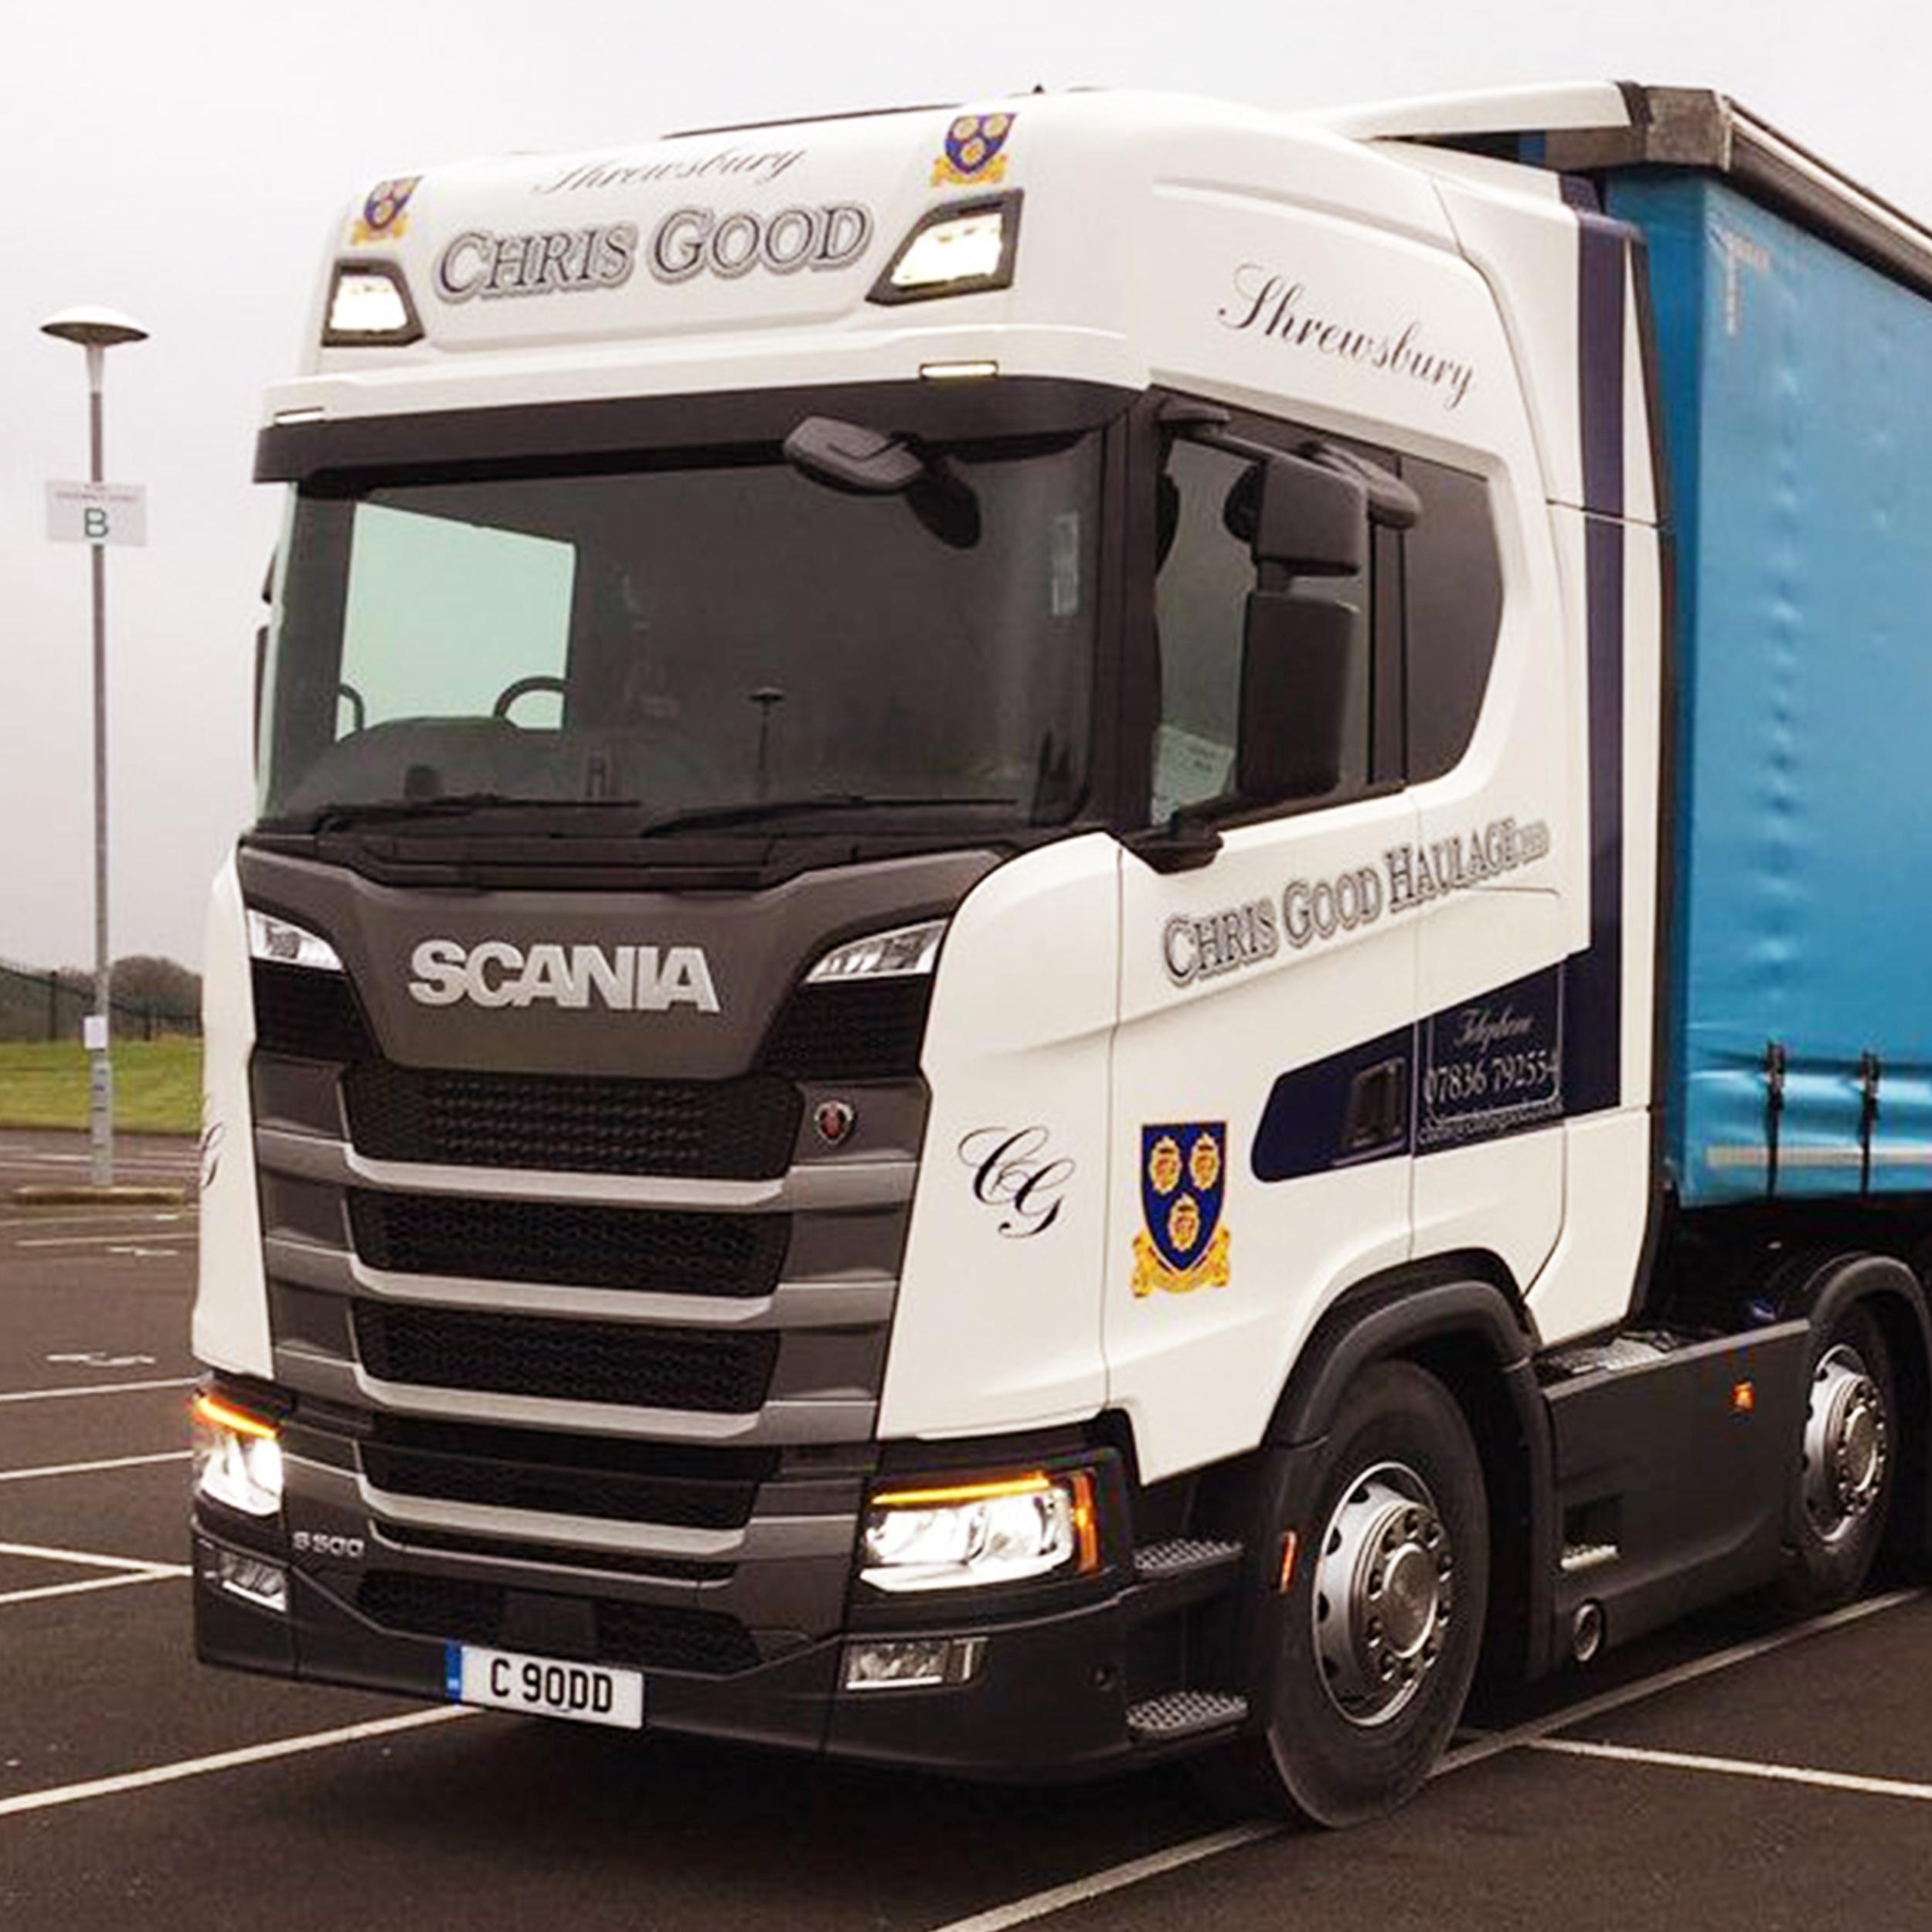 West pennine trucks delivers first uk next gen s series to chris good haulage